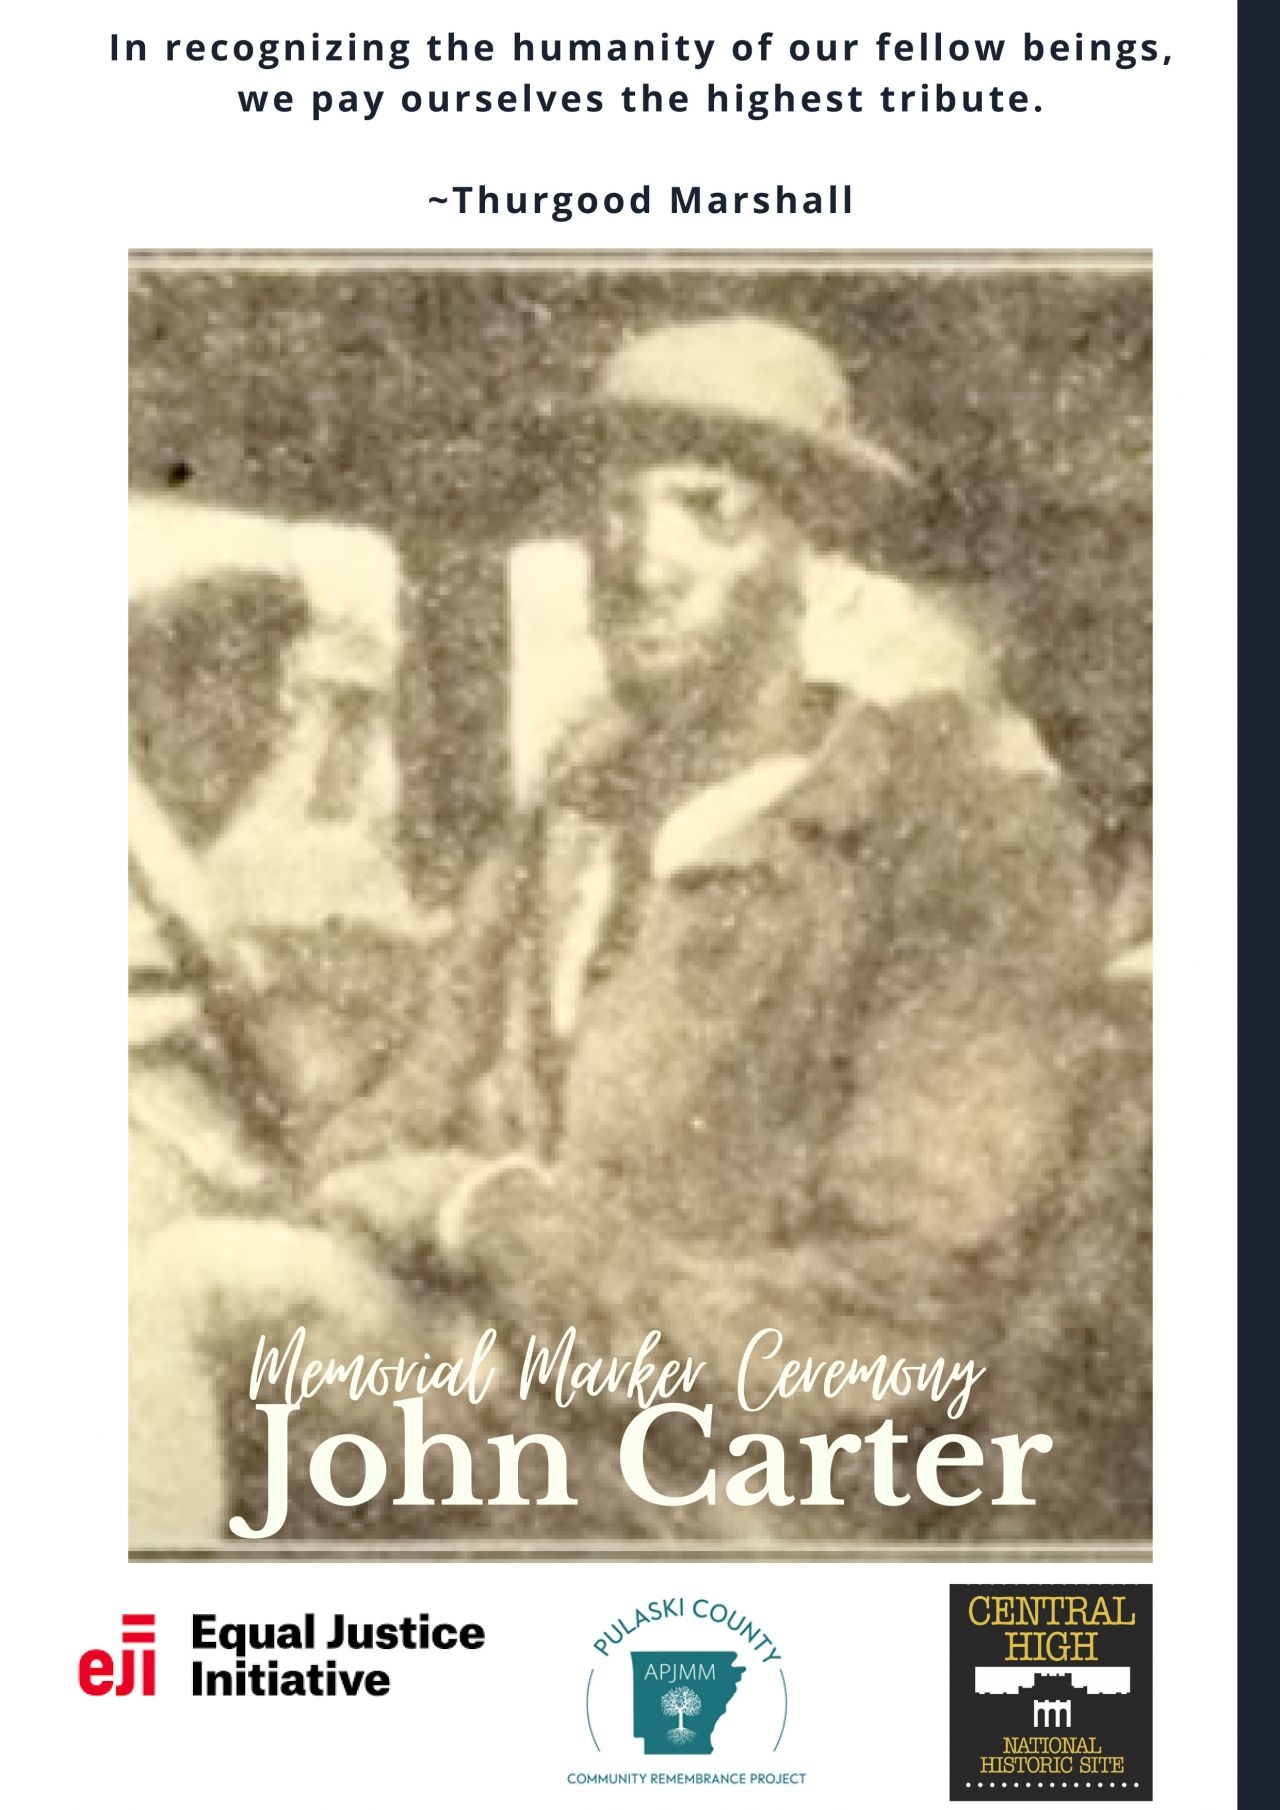 John Carter Memorial Marker Ceremony Program Cover